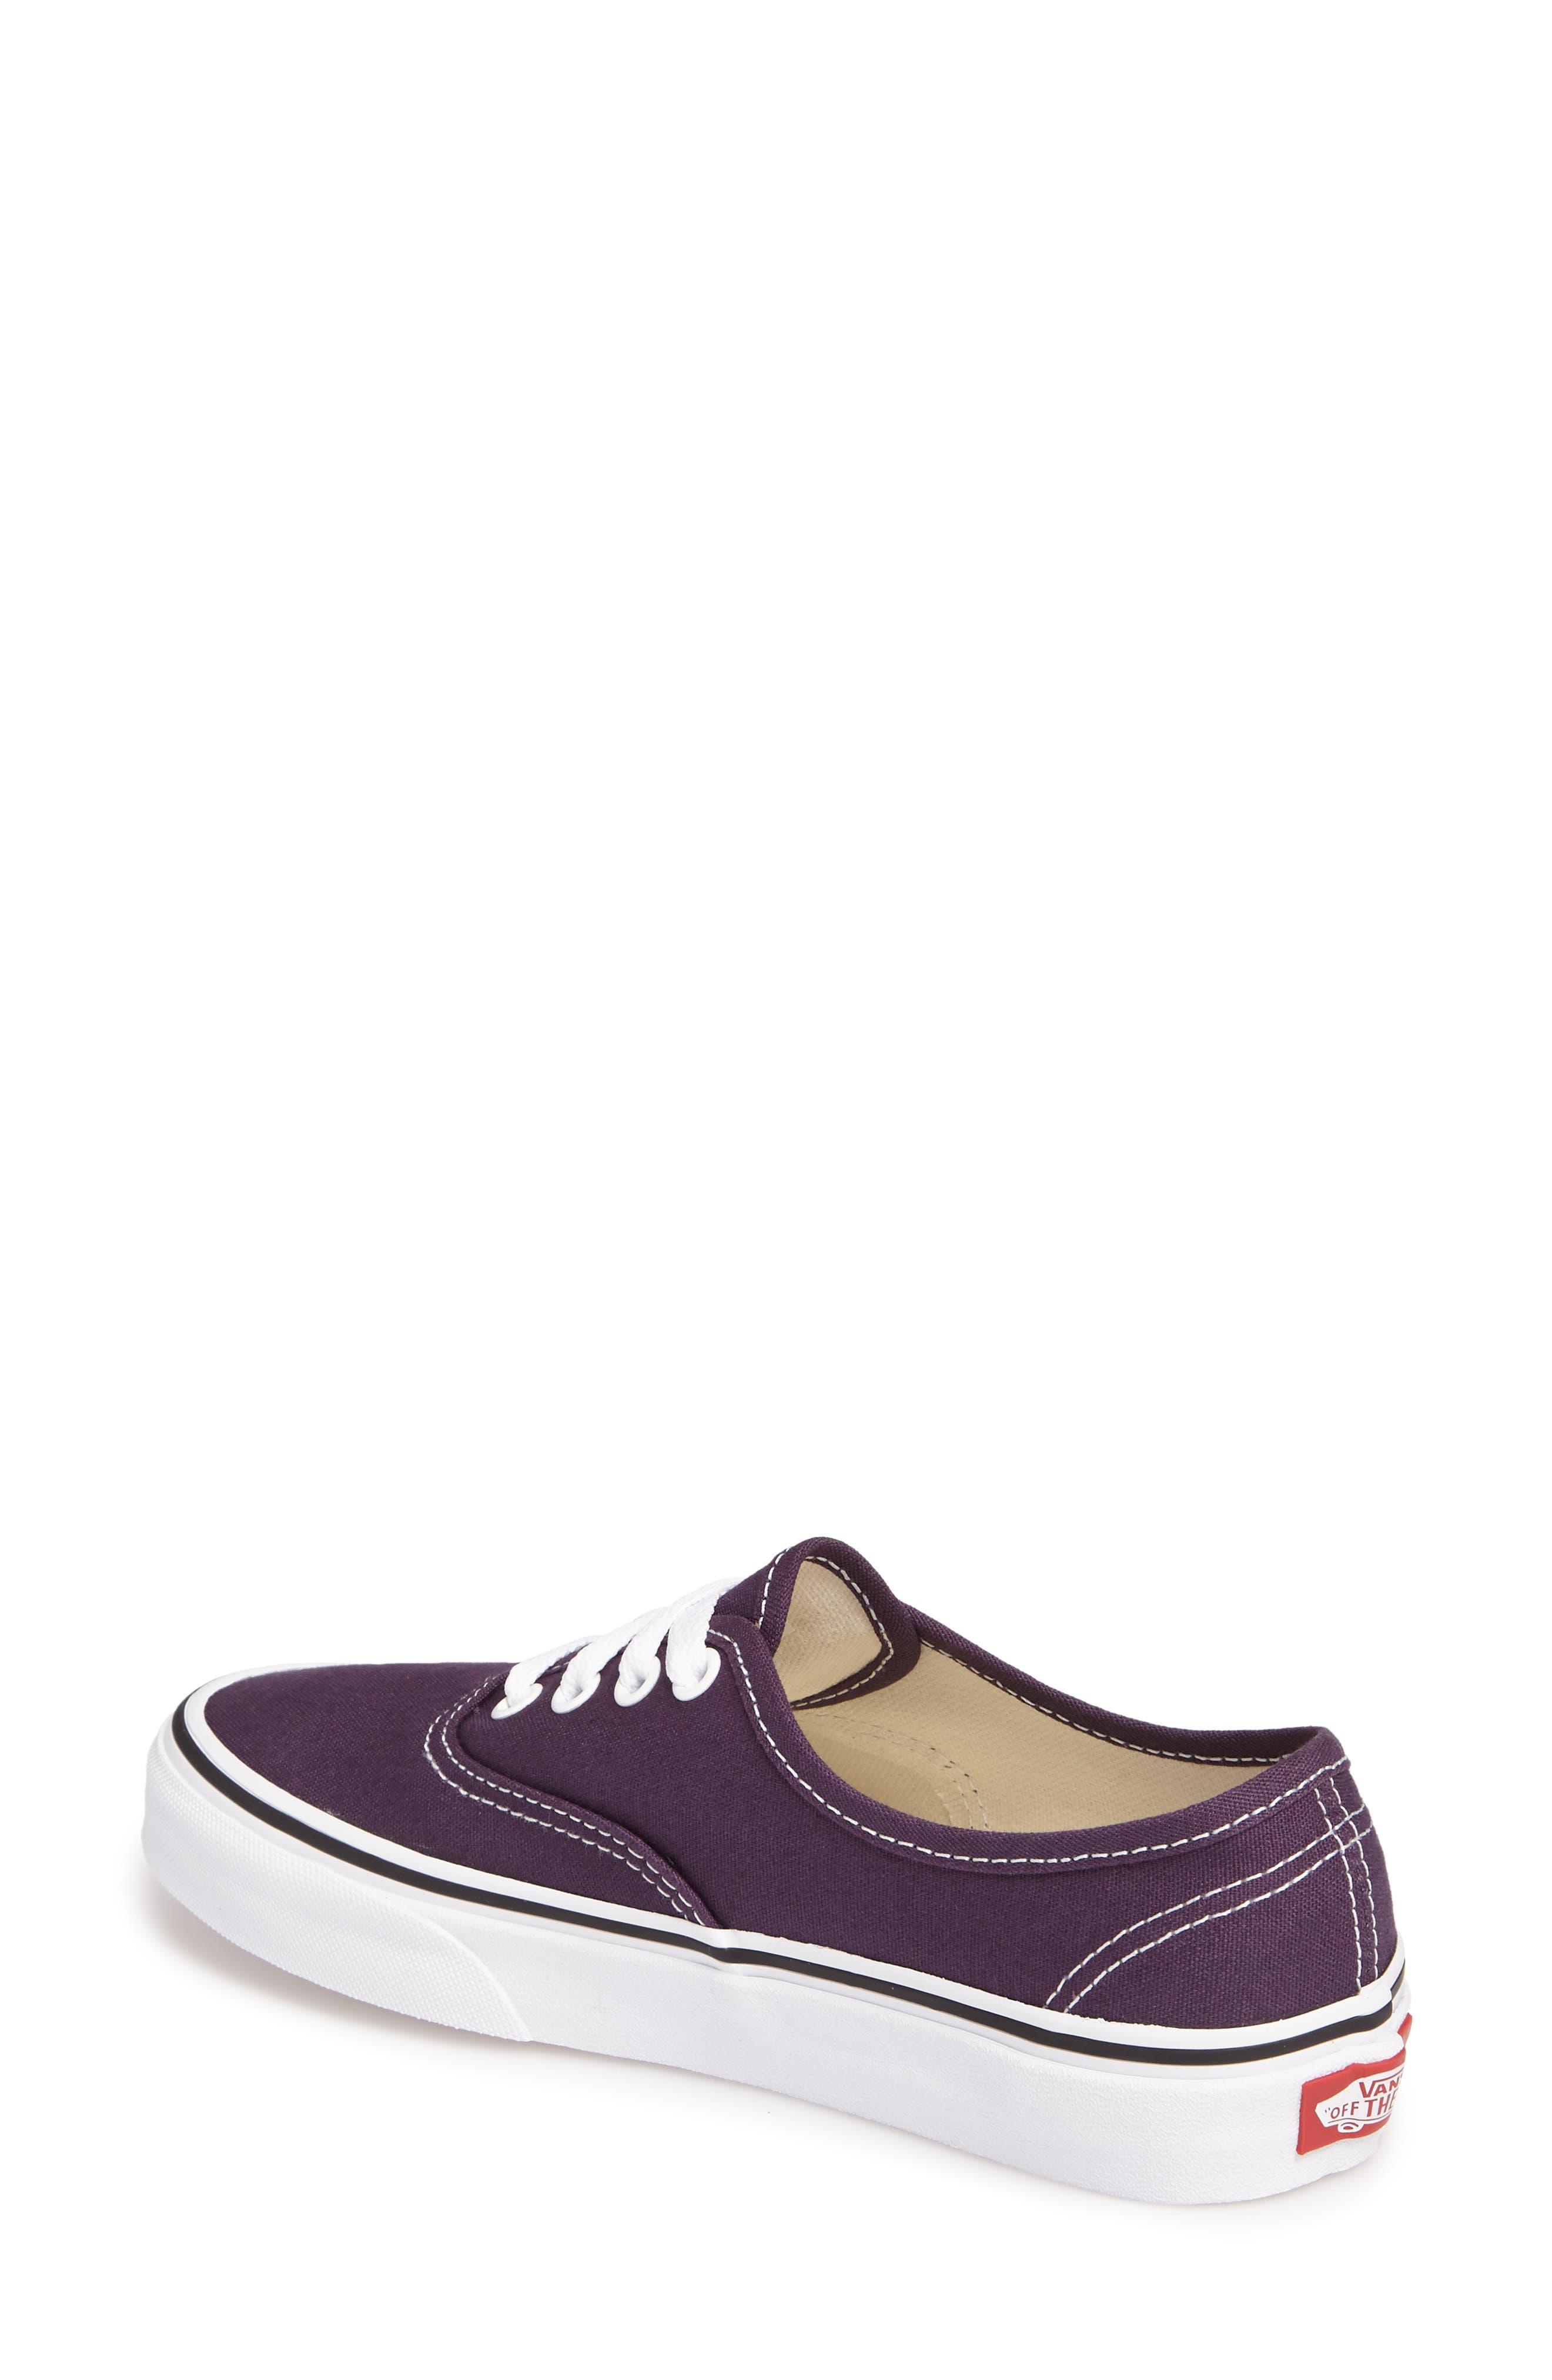 ,                             'Authentic' Sneaker,                             Alternate thumbnail 347, color,                             510